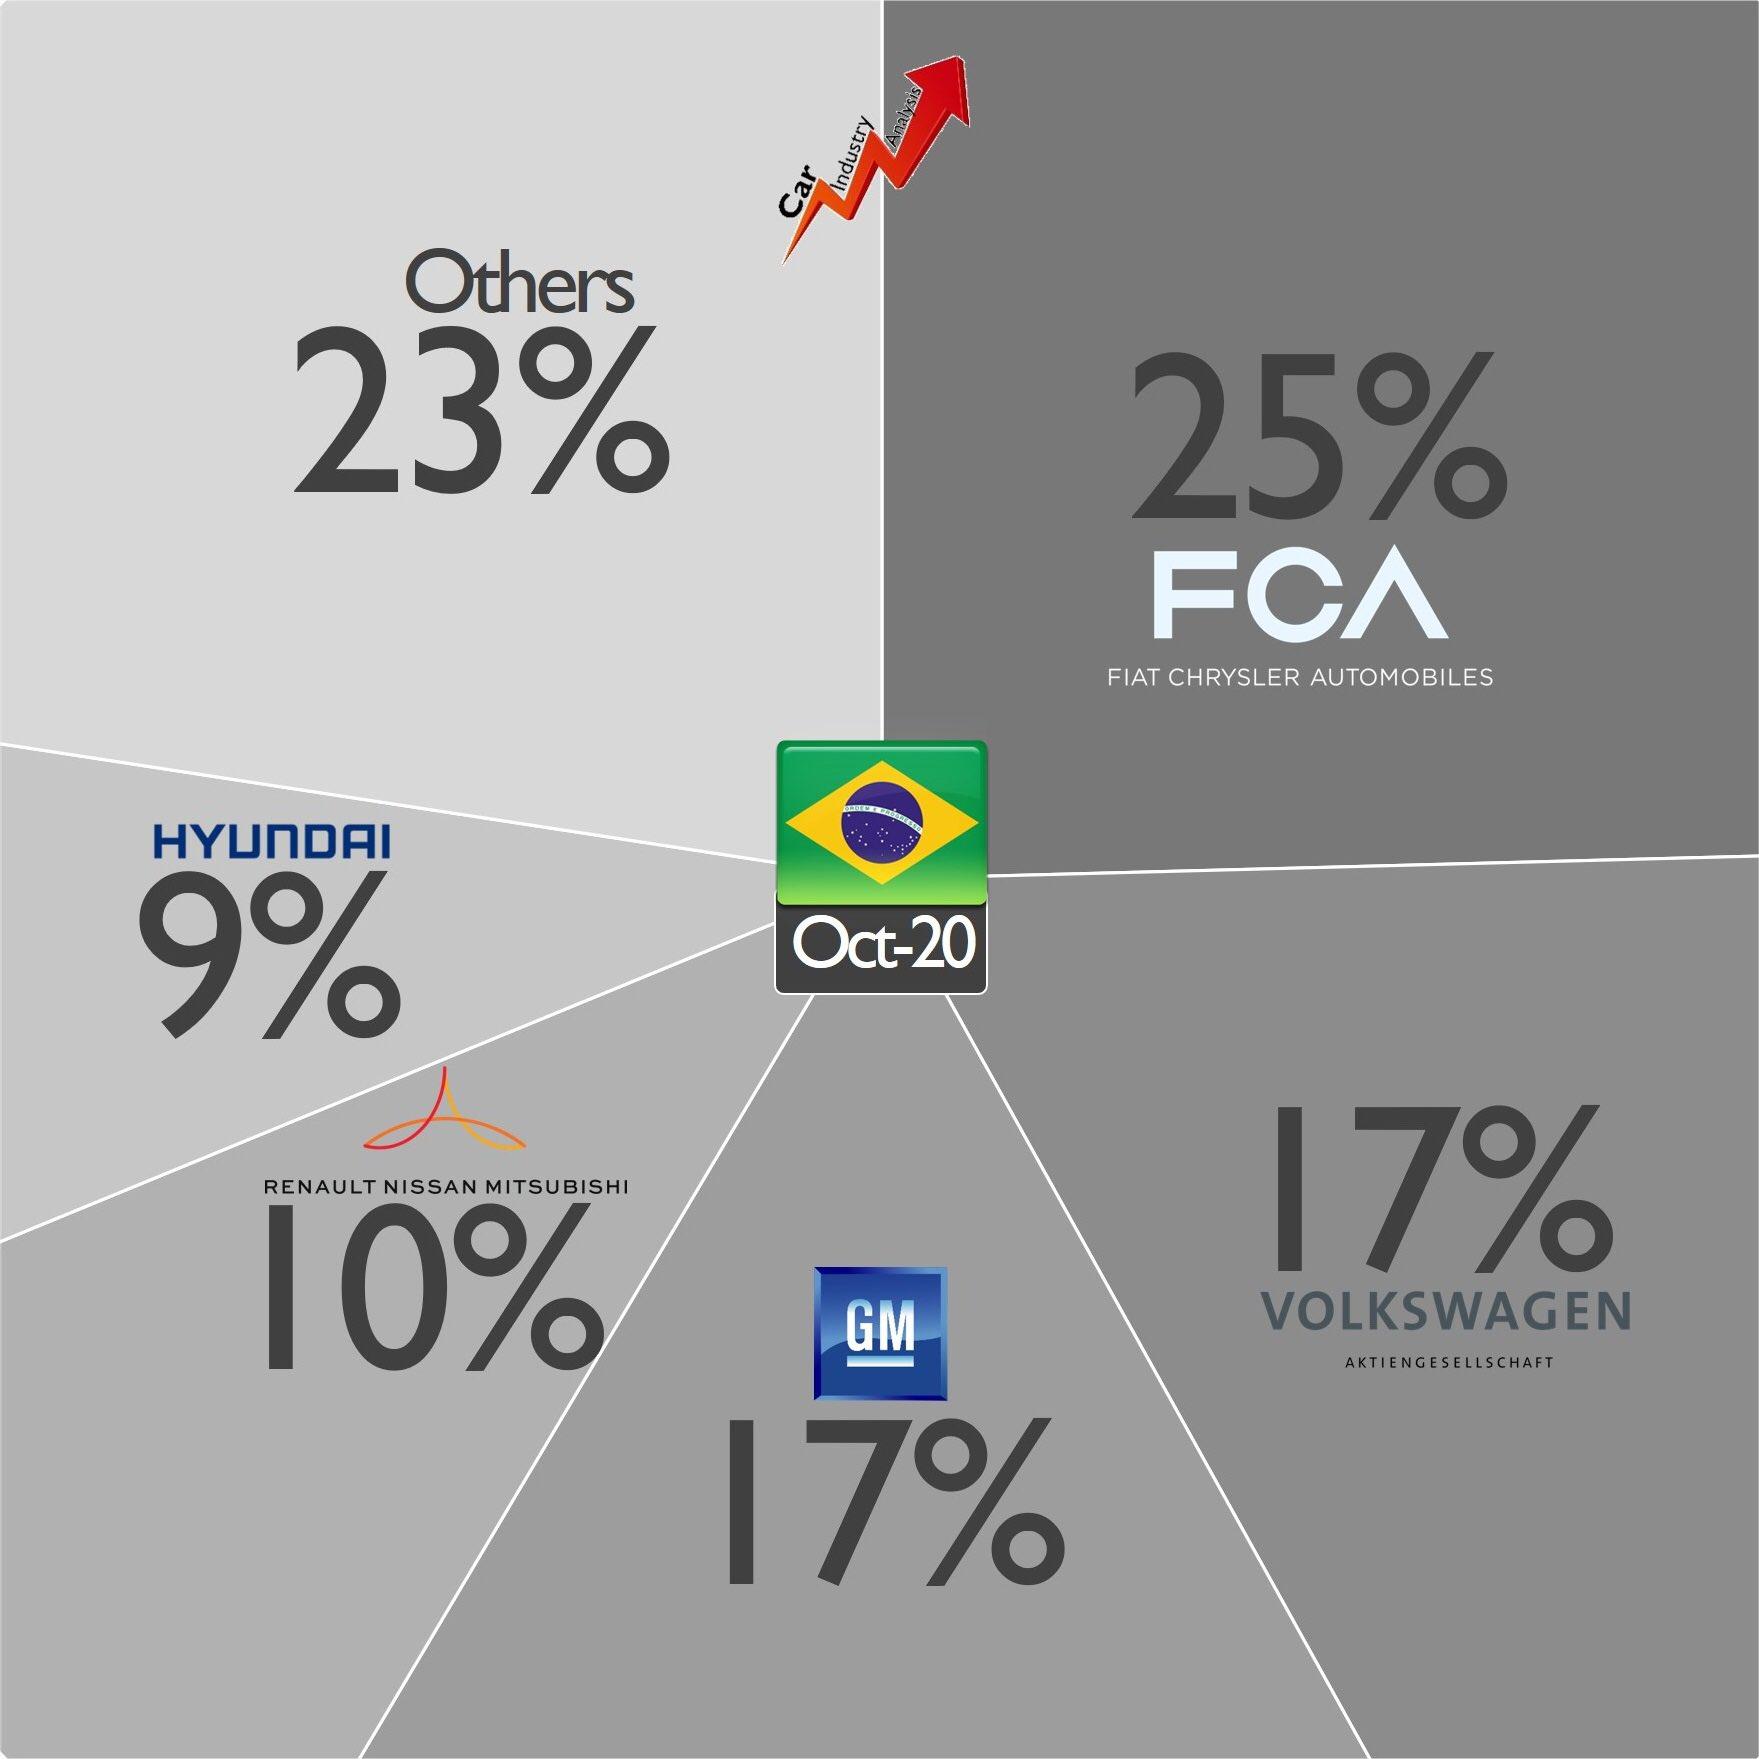 [Statistiques] Les chiffres sud/nord américains  - Page 5 EmE26OaXYAUCbZu?format=jpg&name=large